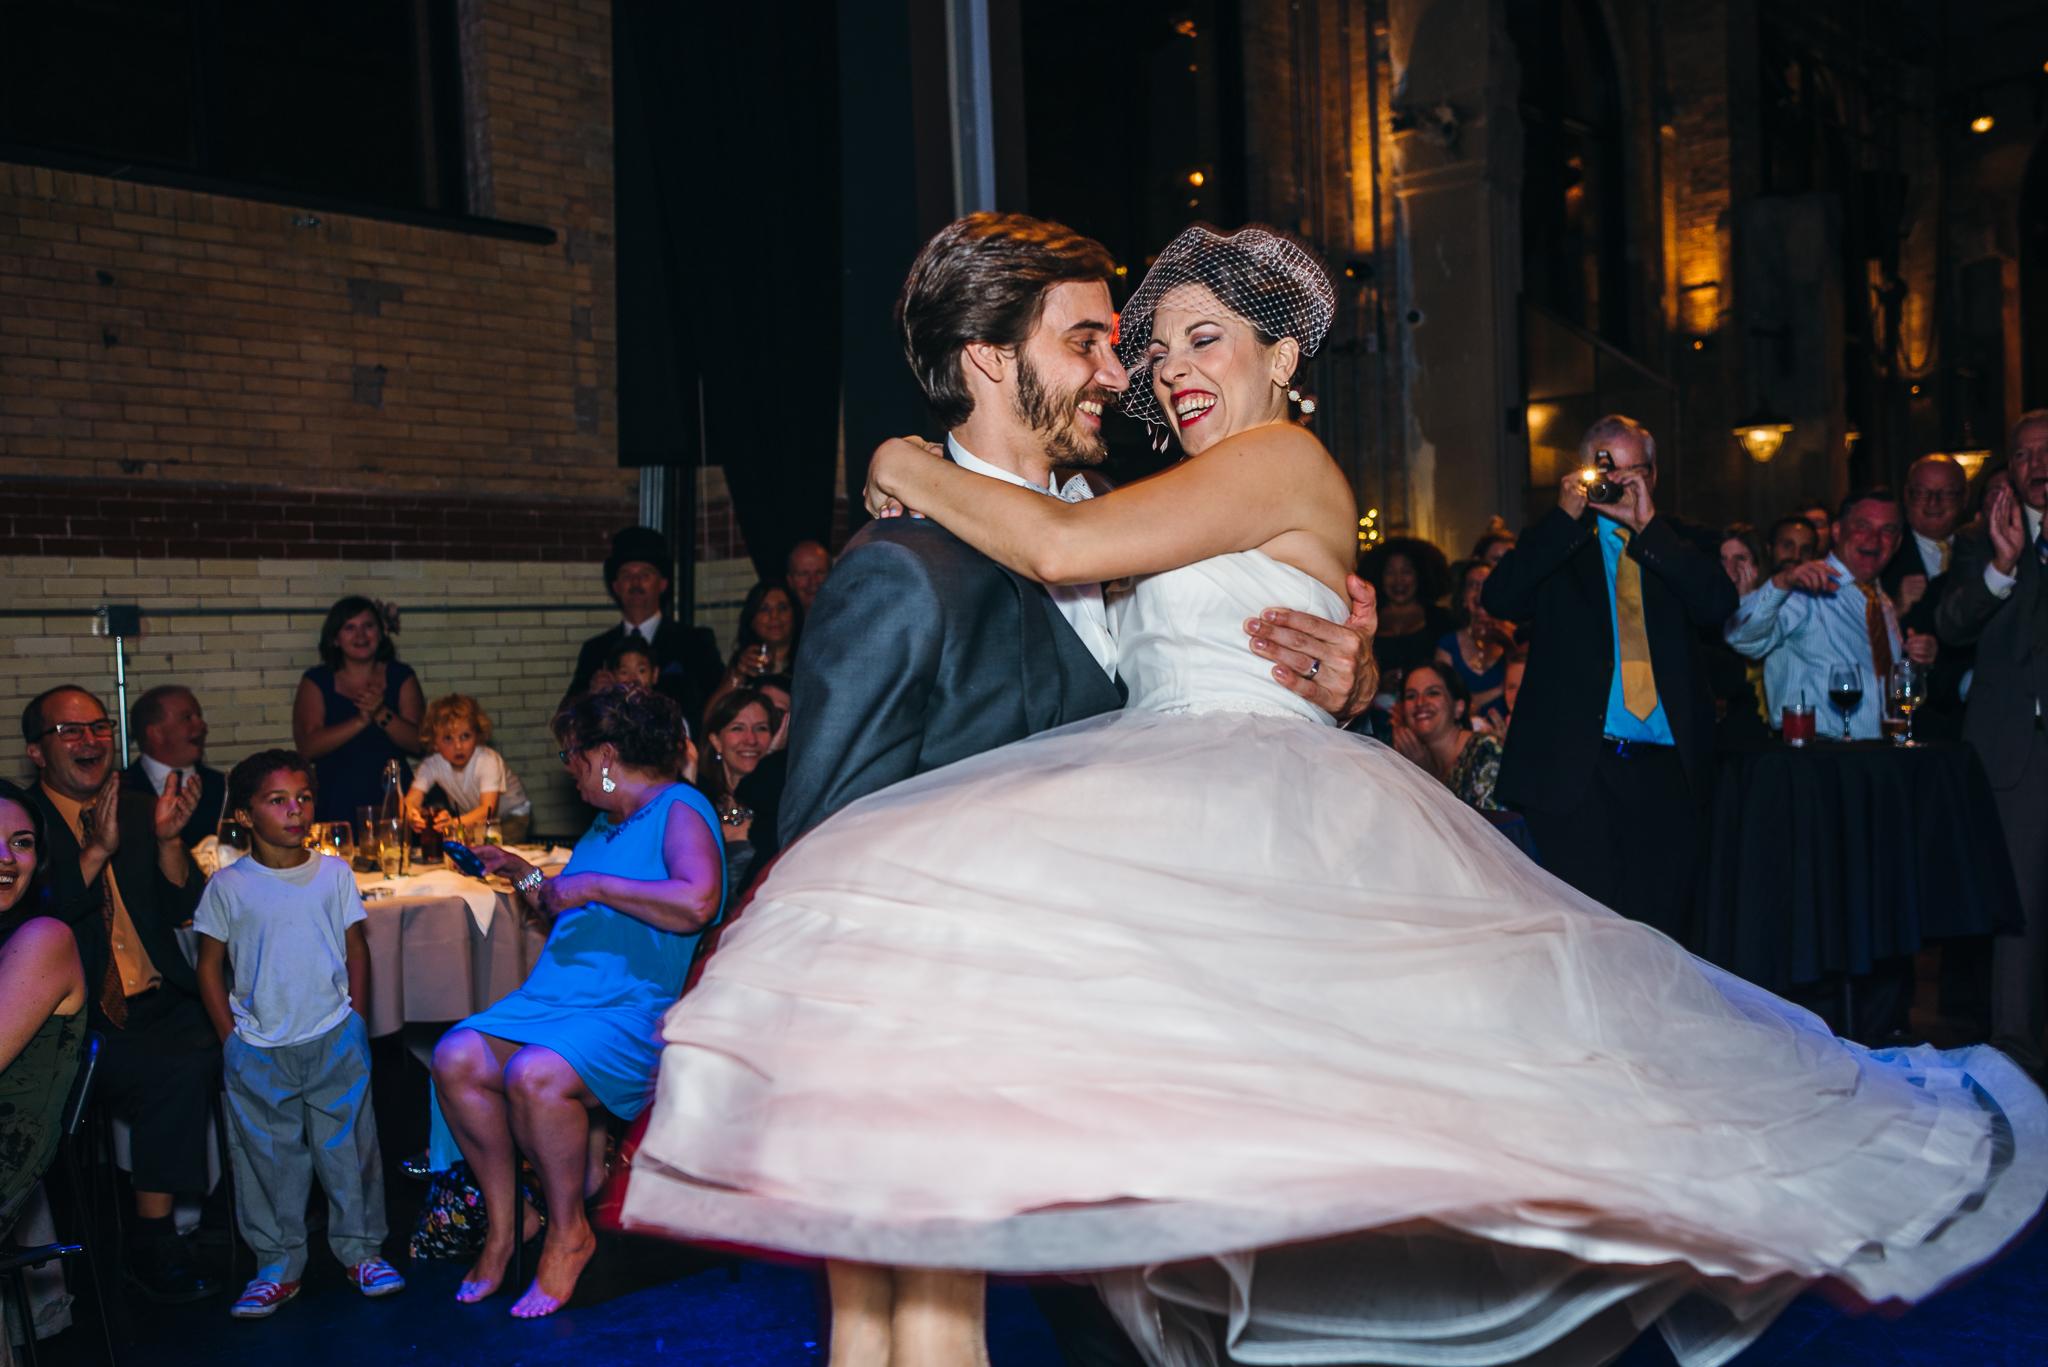 la_peg_fringe_arts_wedding-0027.jpg